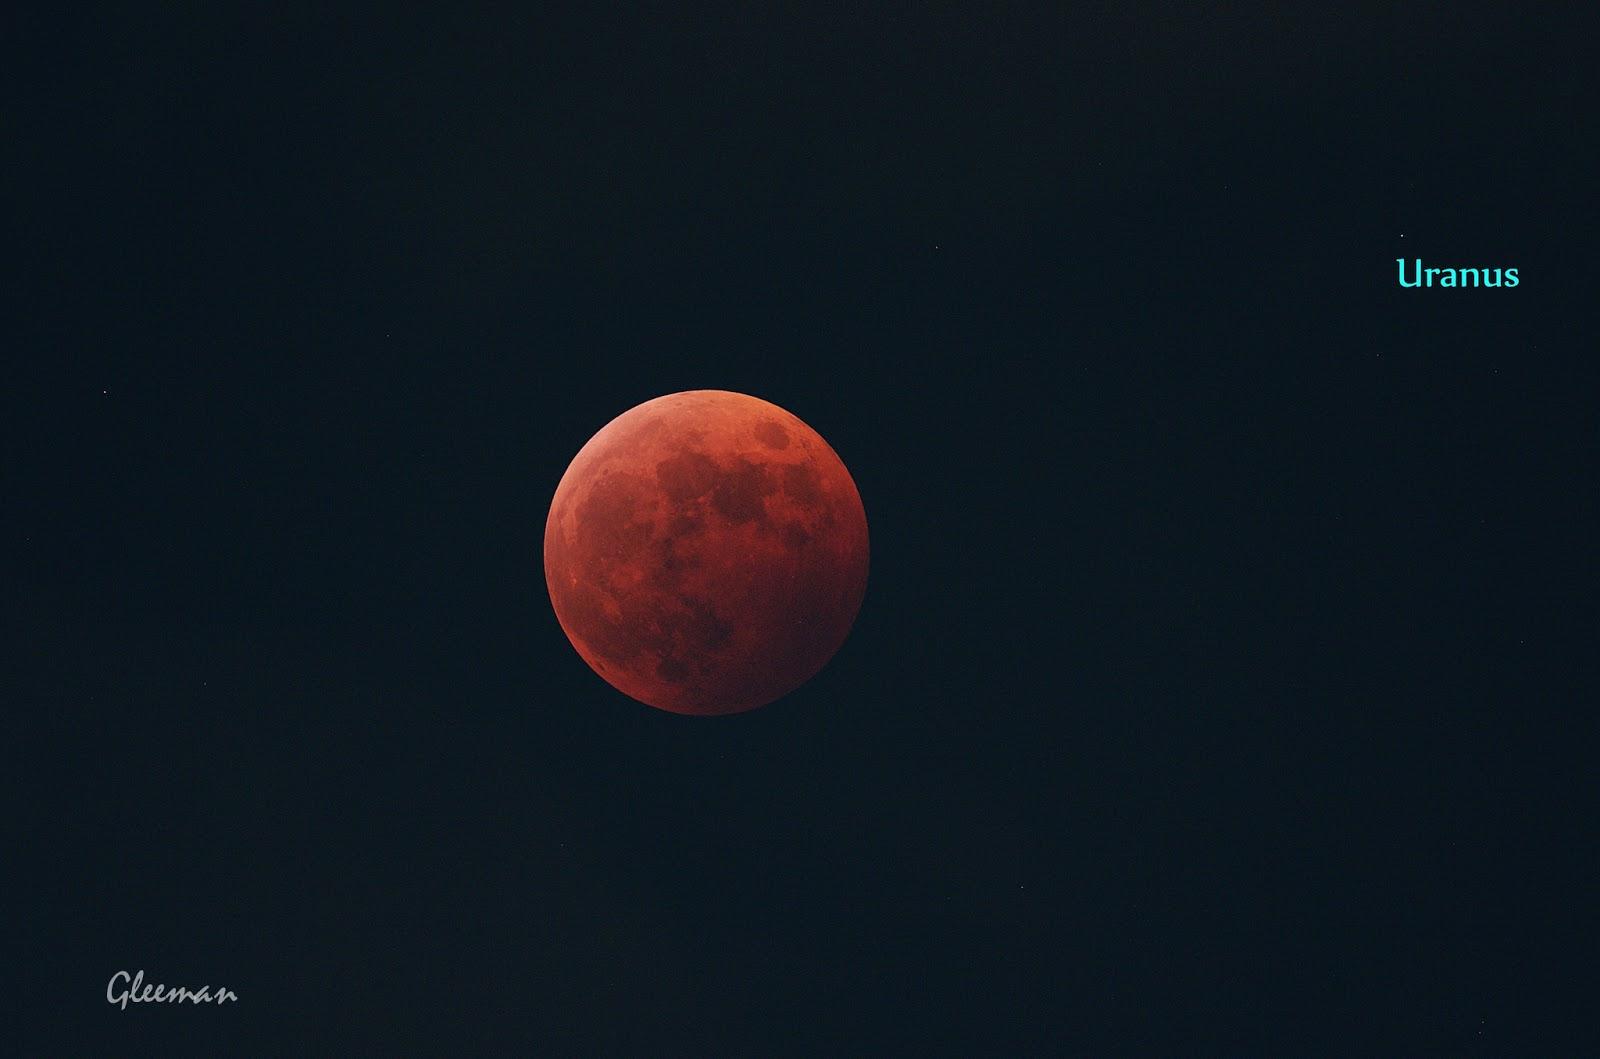 月全食與天王星衝   Total lunar eclipse and Uranus opposition